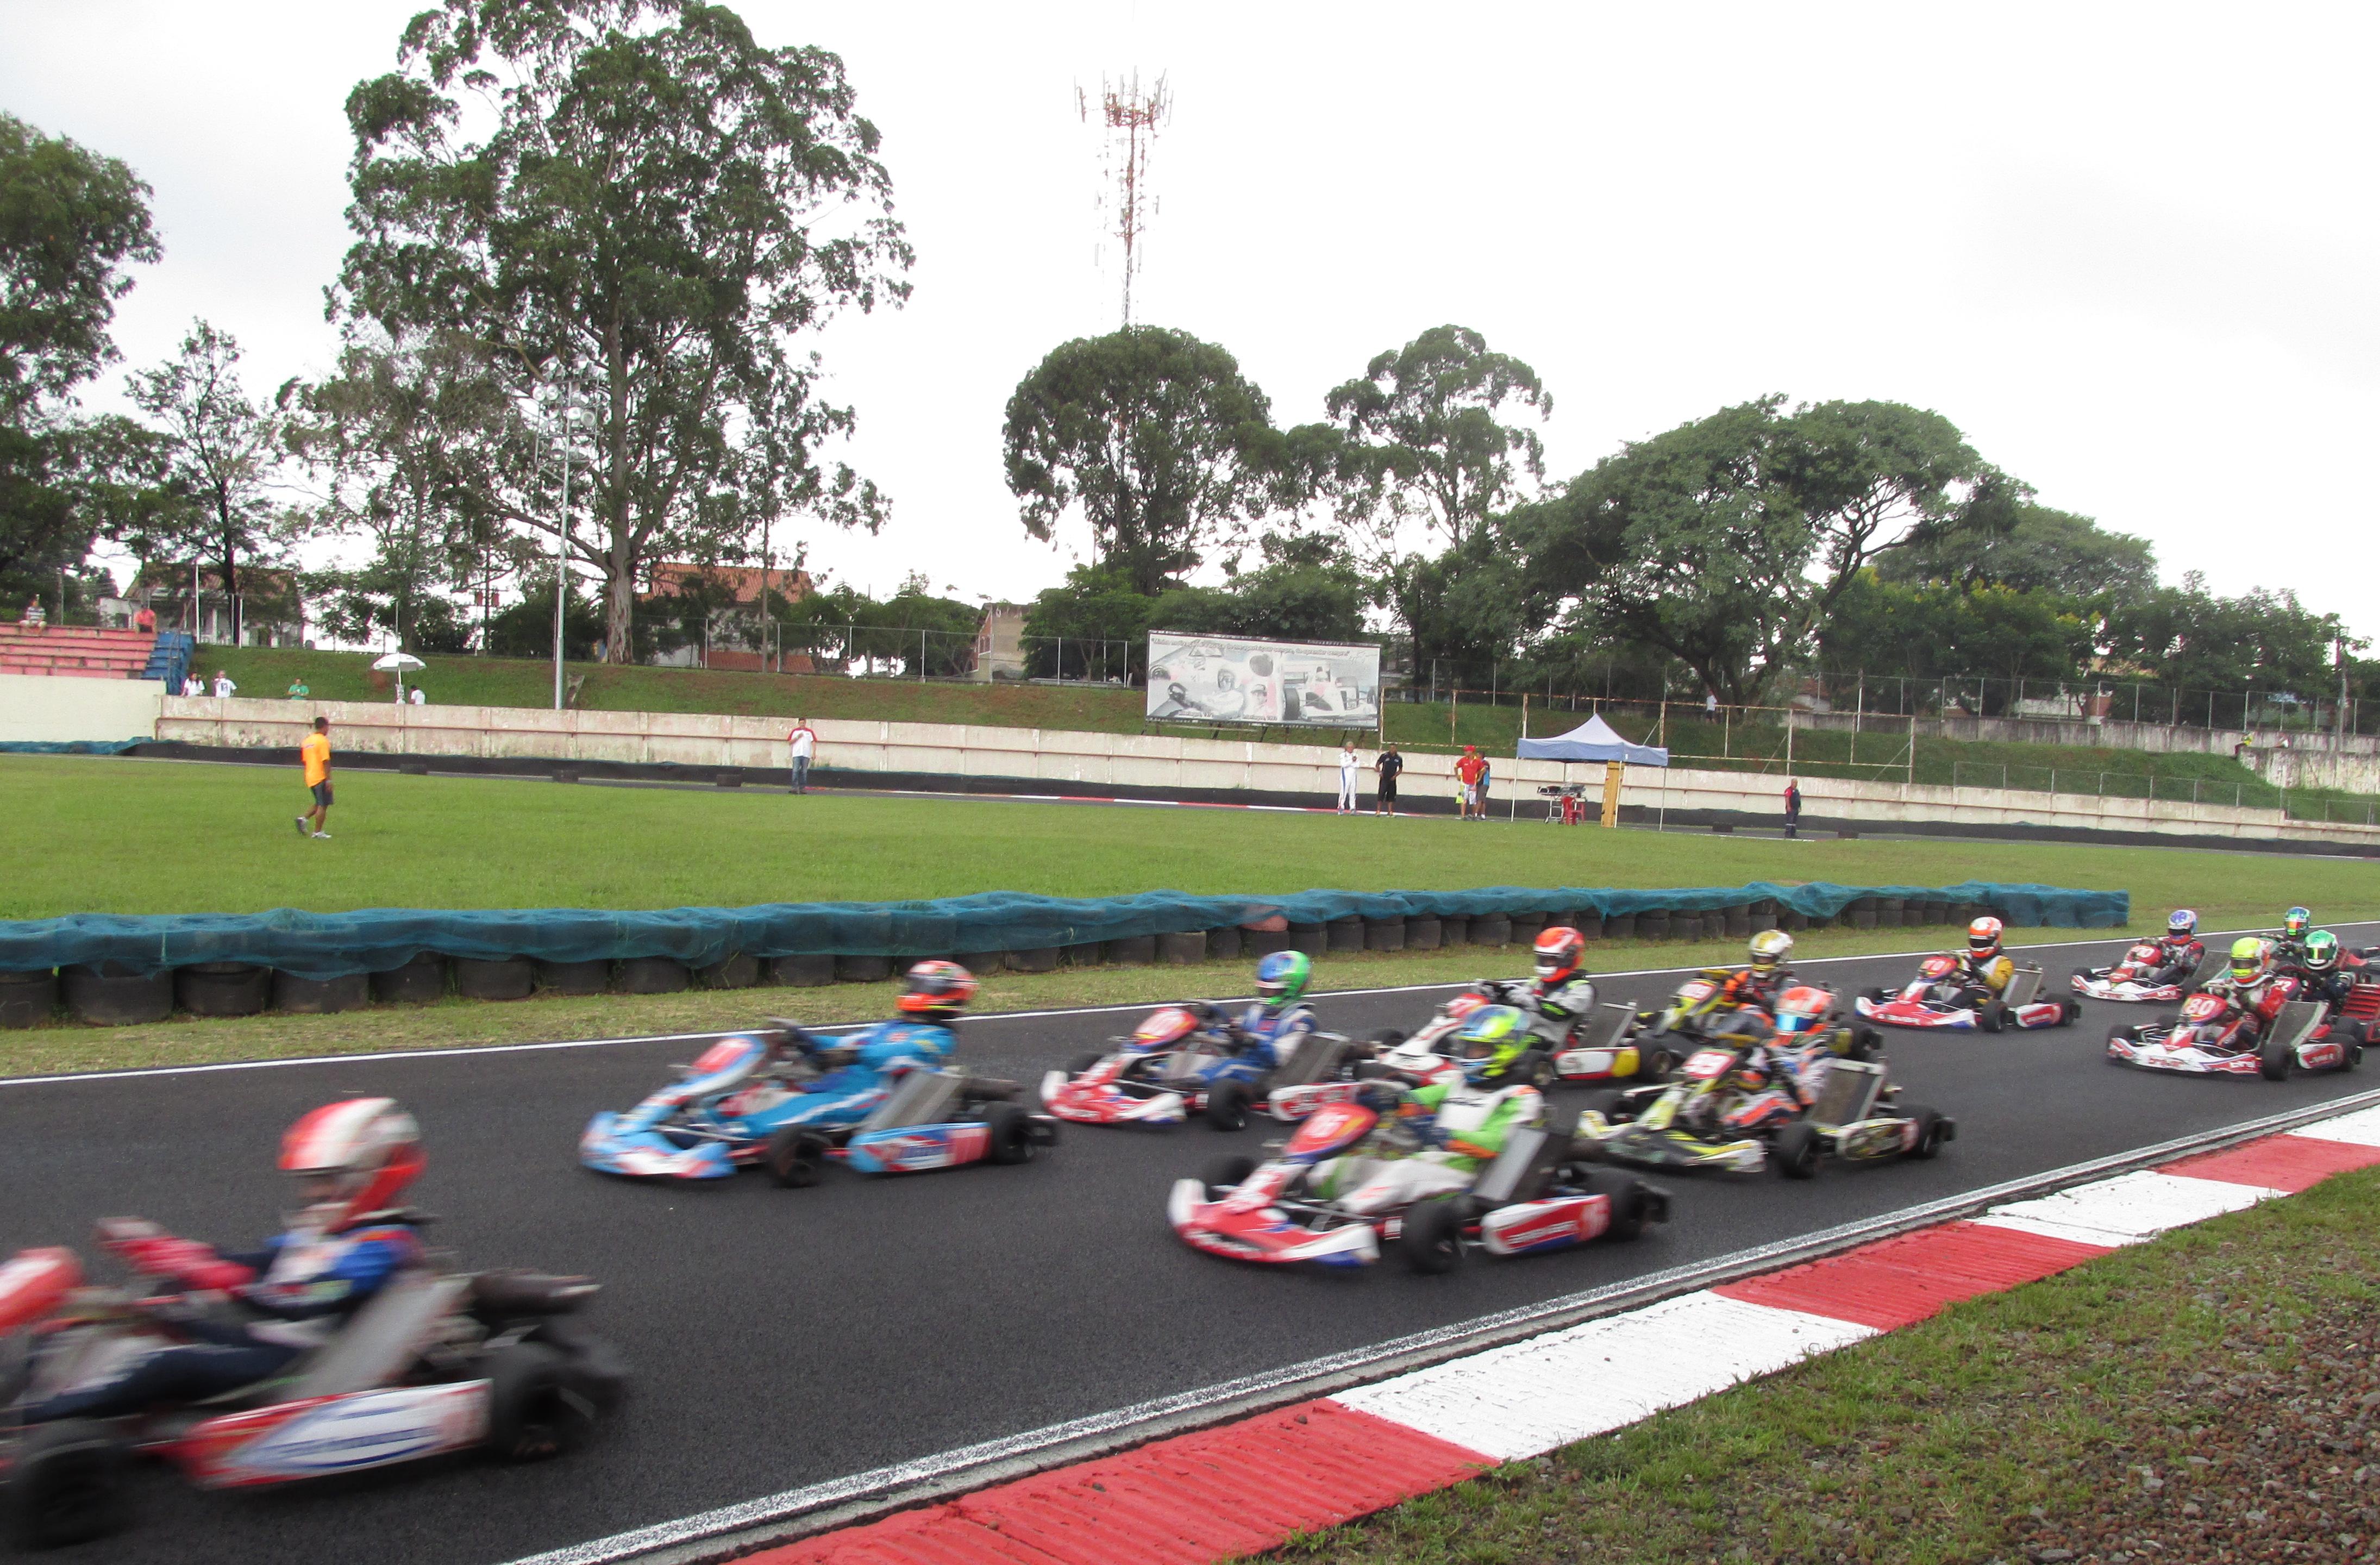 Primeira etapa do Campeonato Paulista de Kart – SKB 2015. Foto: Daniel Maso/ SPTuris.